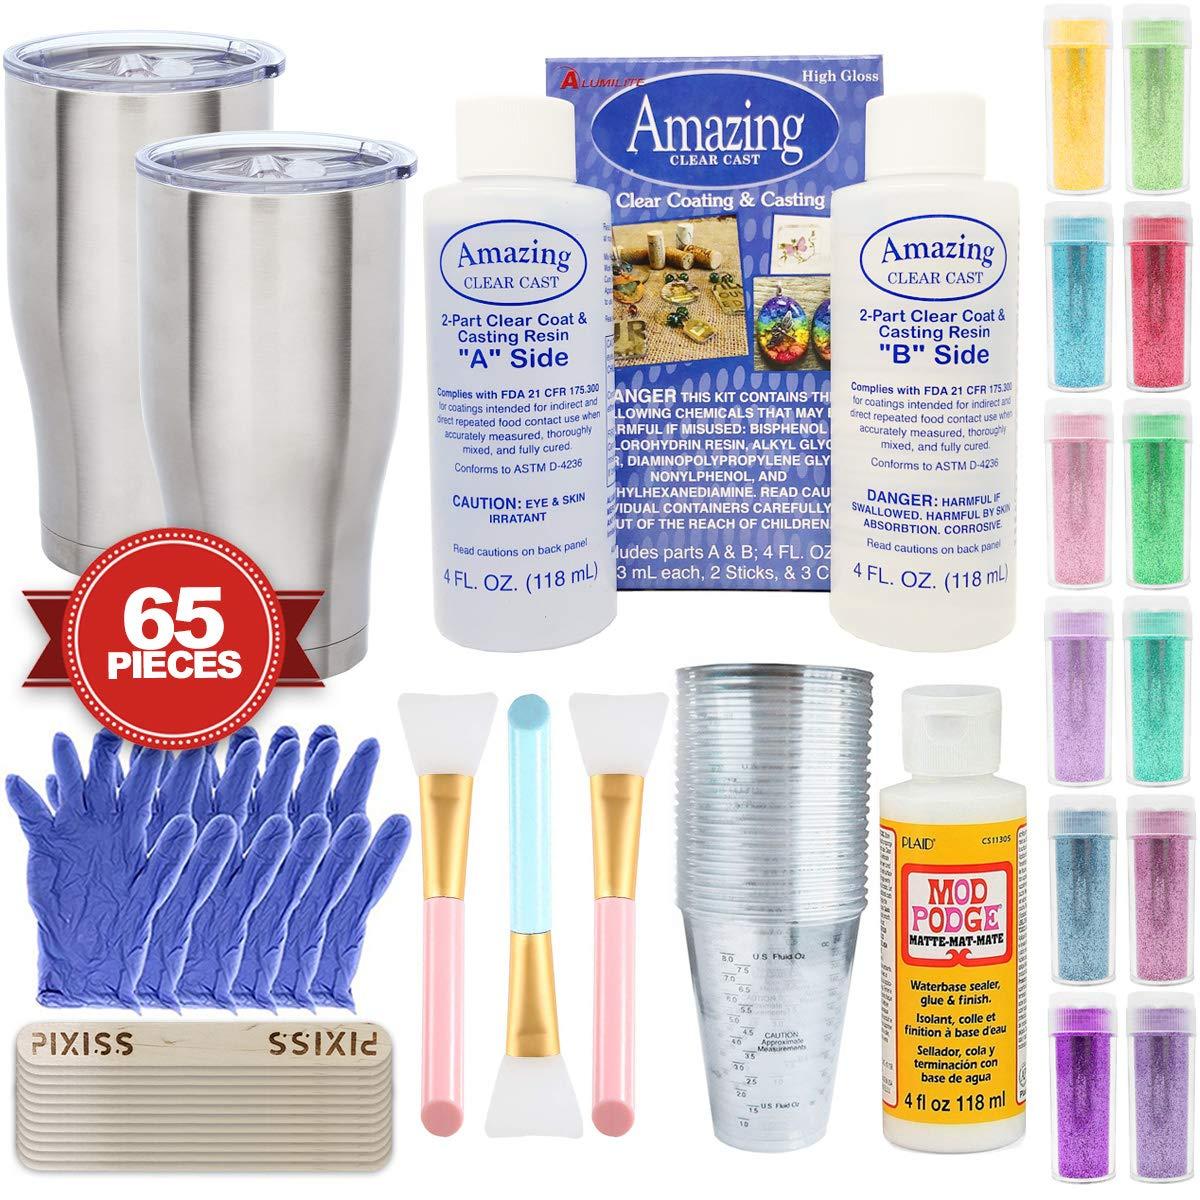 Epoxy Glitter Tumblers Kit, Includes Amazing Clear Cast Epoxy for Tumblers, Silicone Epoxy Resin Brushes, Glitter, Mod Podge